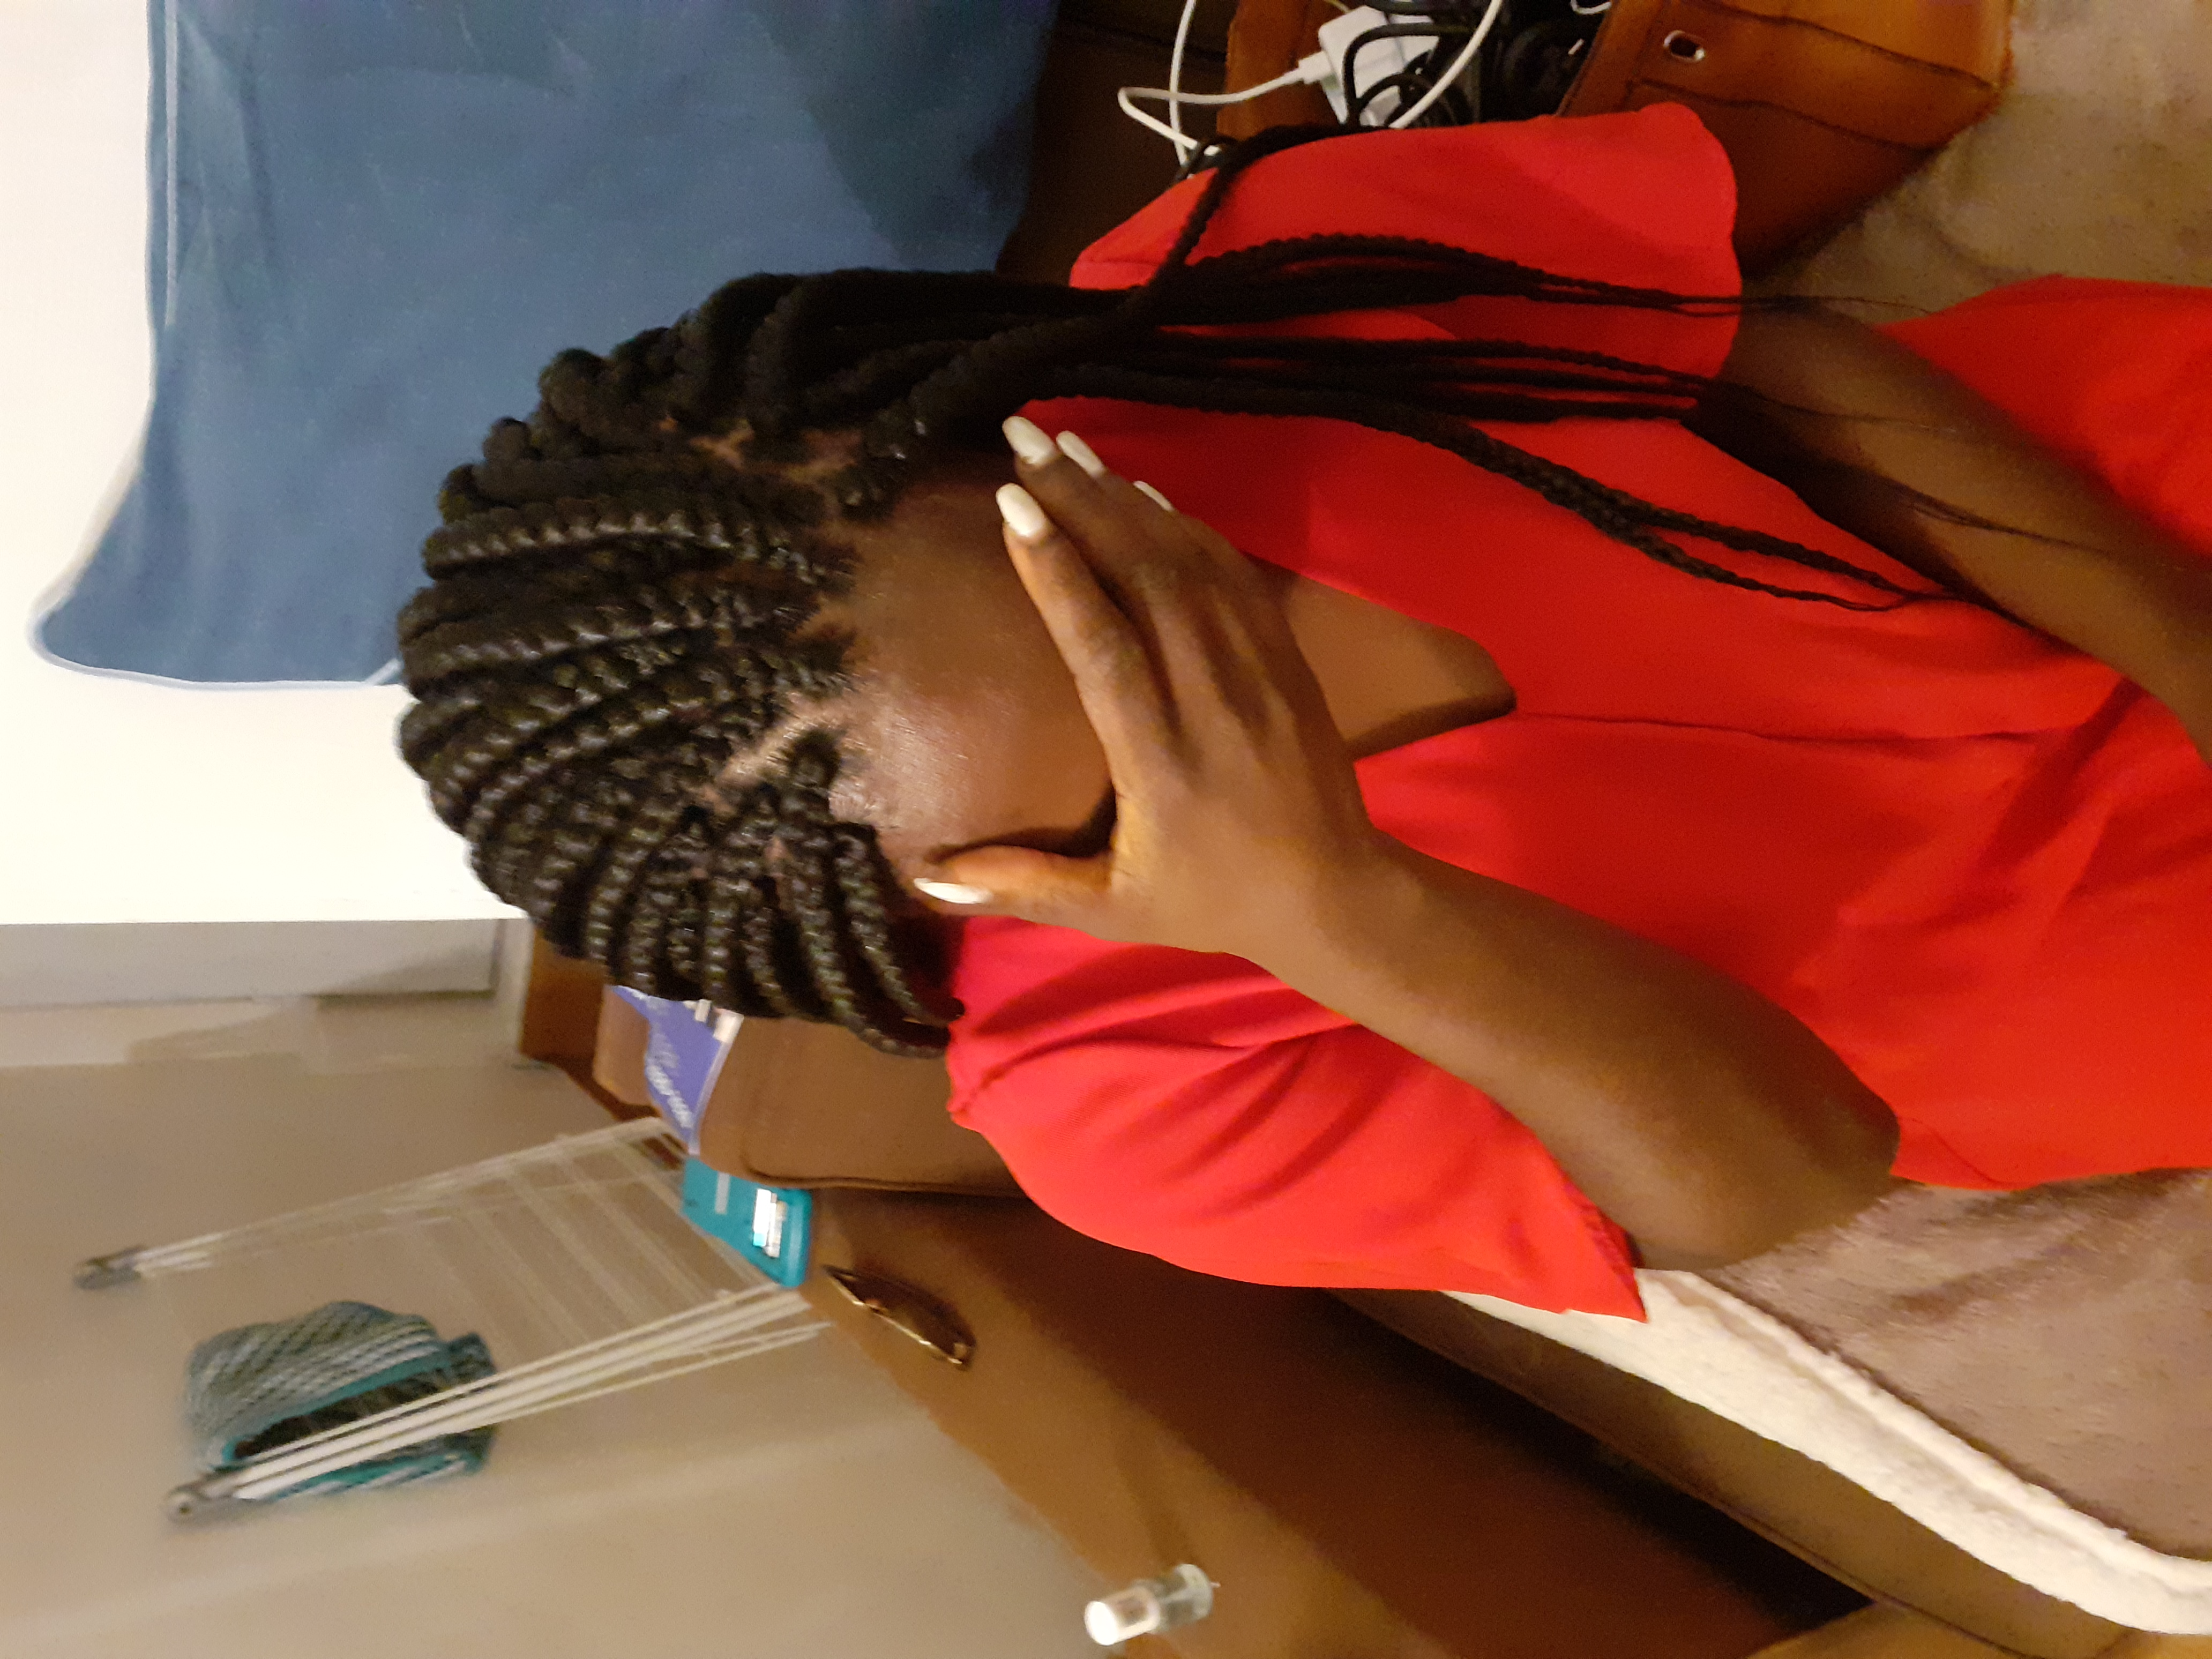 salon de coiffure afro tresse tresses box braids crochet braids vanilles tissages paris 75 77 78 91 92 93 94 95 YBDHBKYL